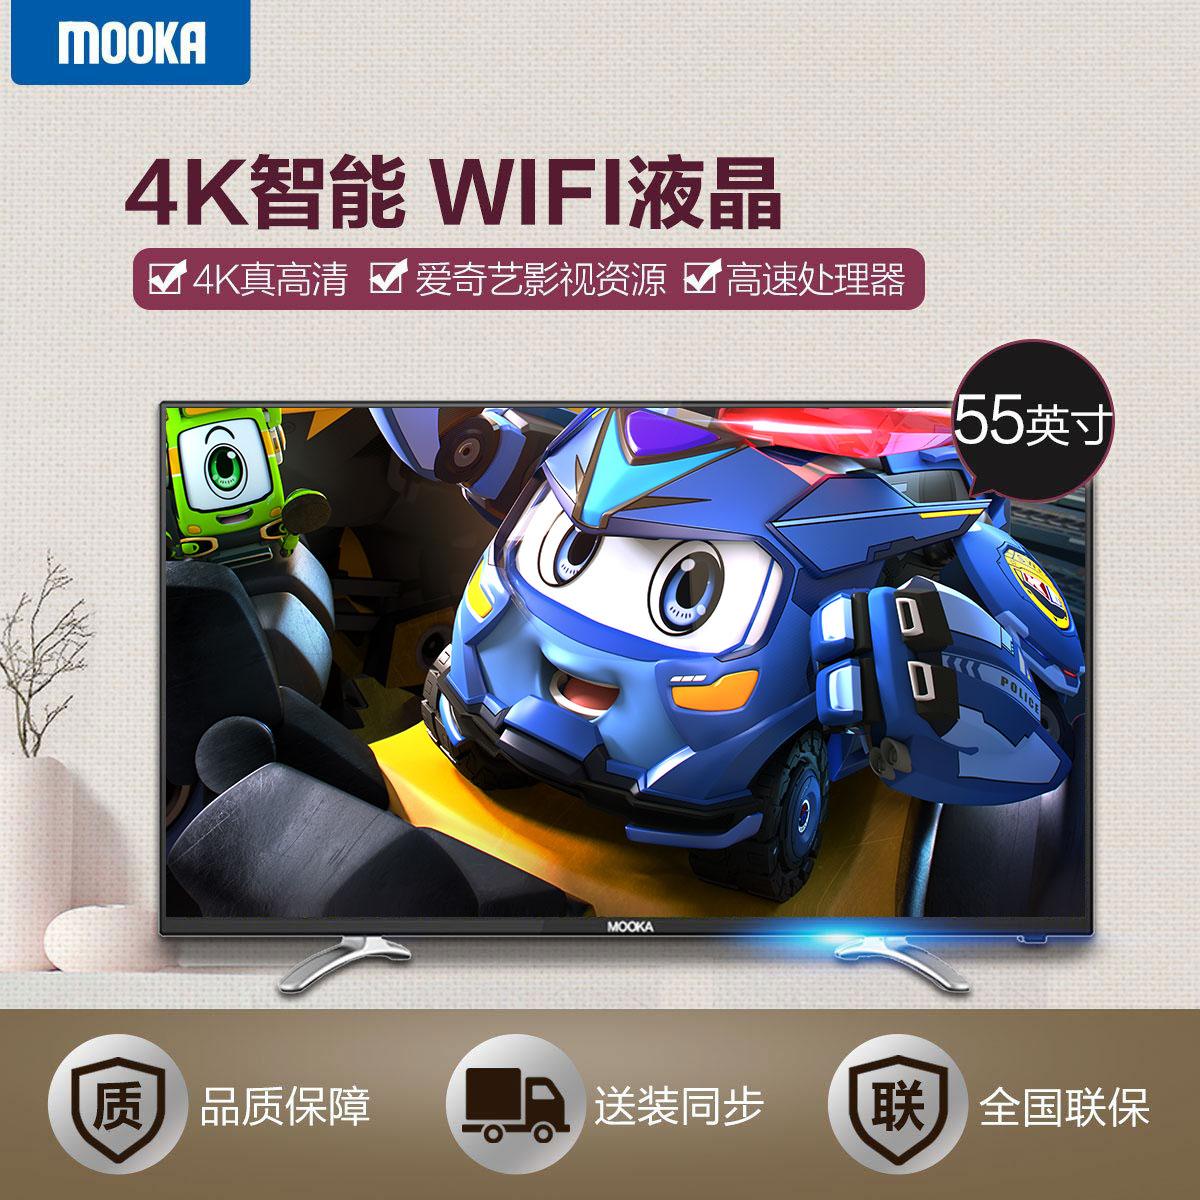 4K超高清,网络智能,64位处理器 U55A5  55英寸超高清网络智能电视机